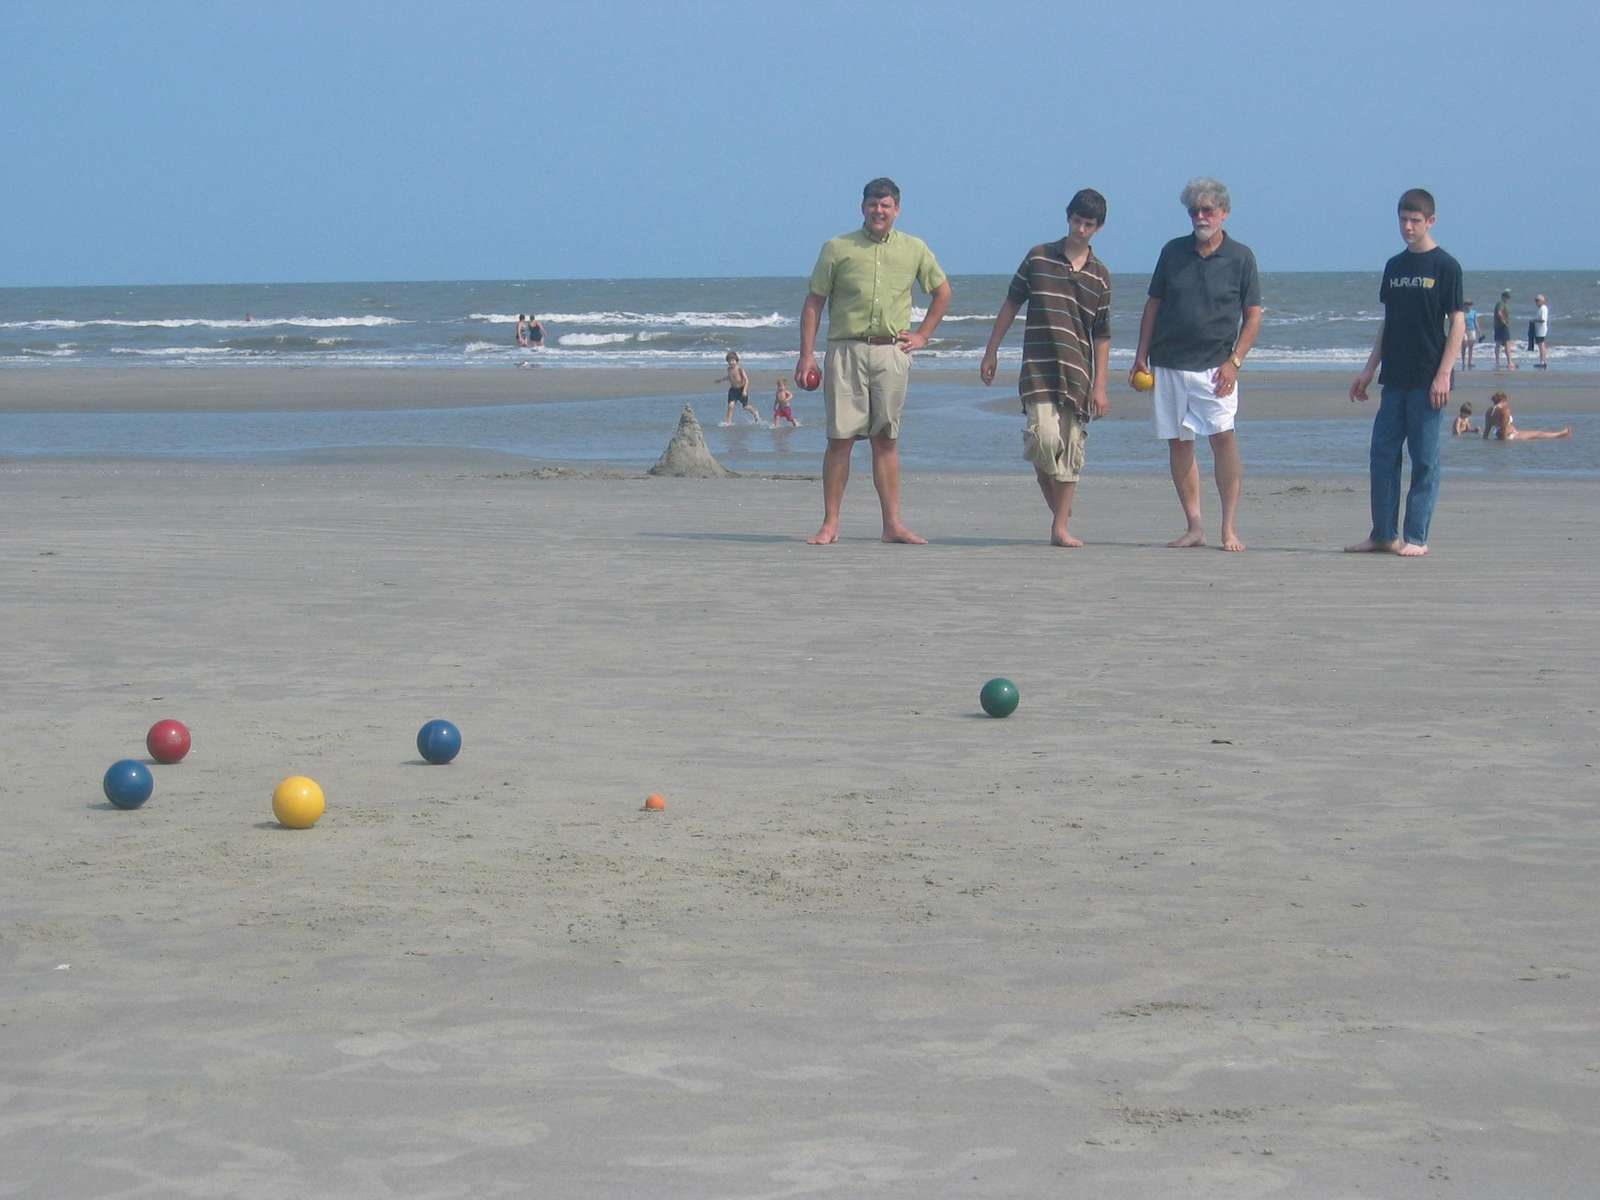 Playing Bocci Ball on the Beach